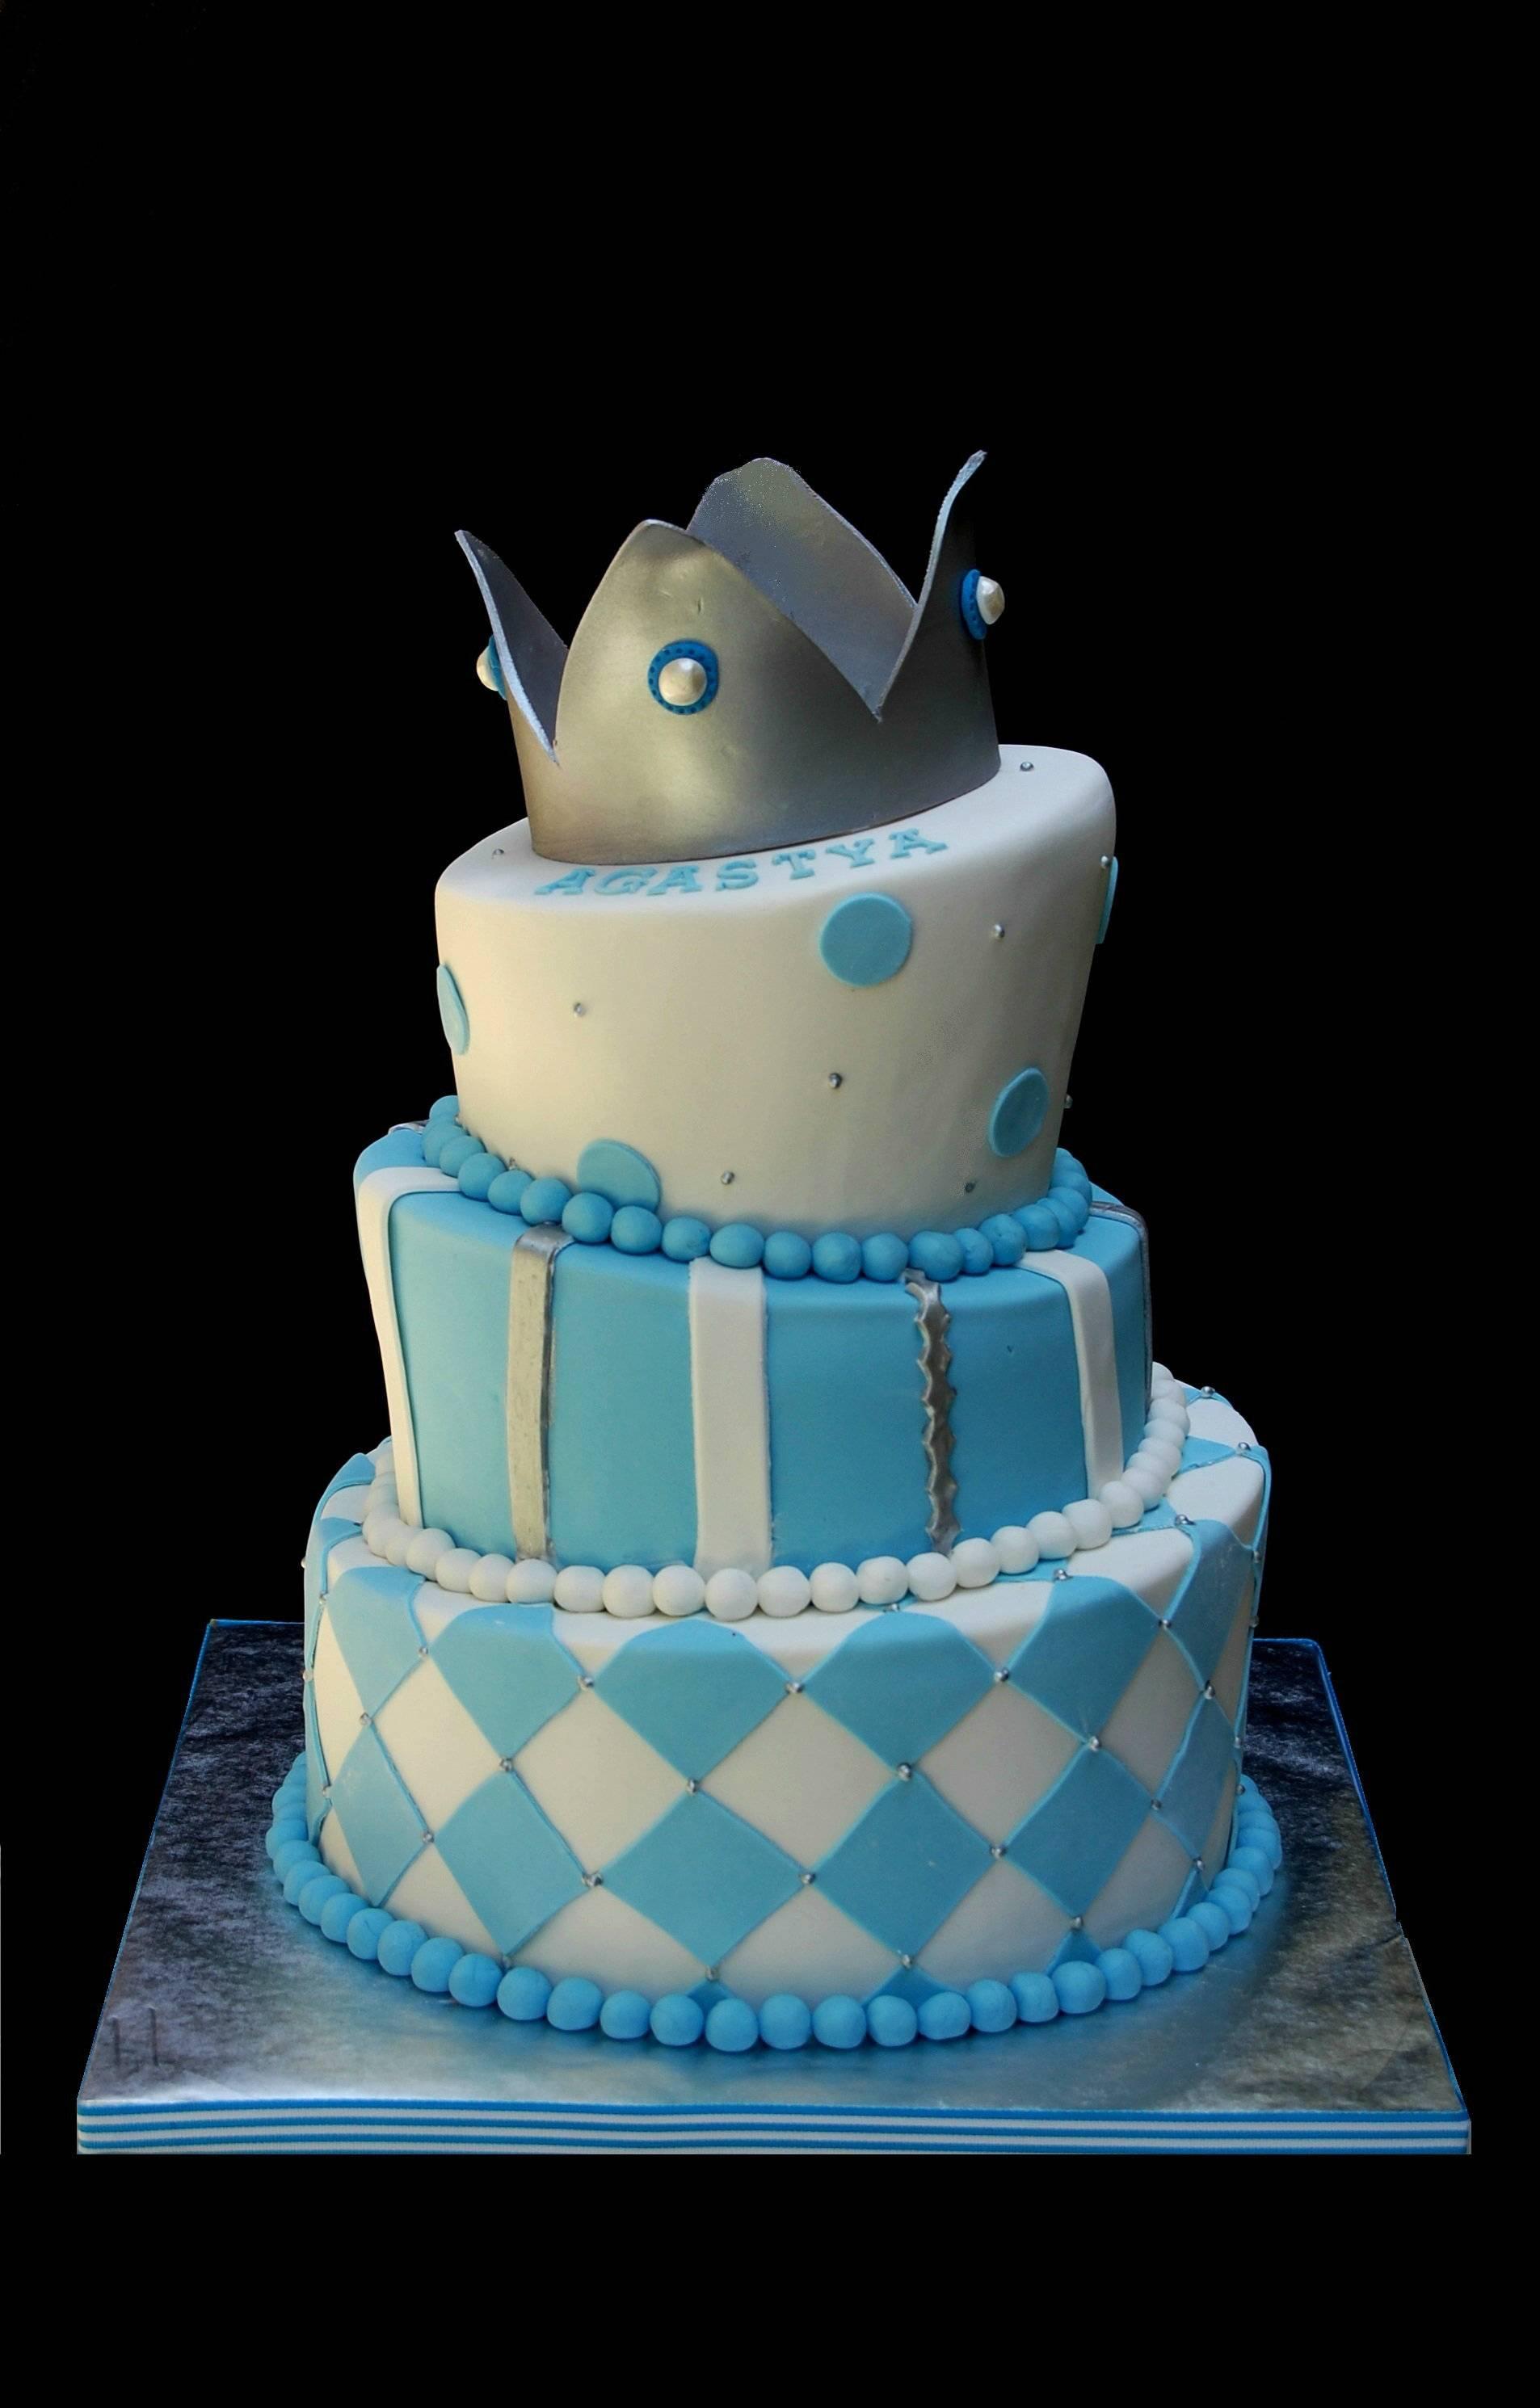 Topsy turvy Prince themed Cake